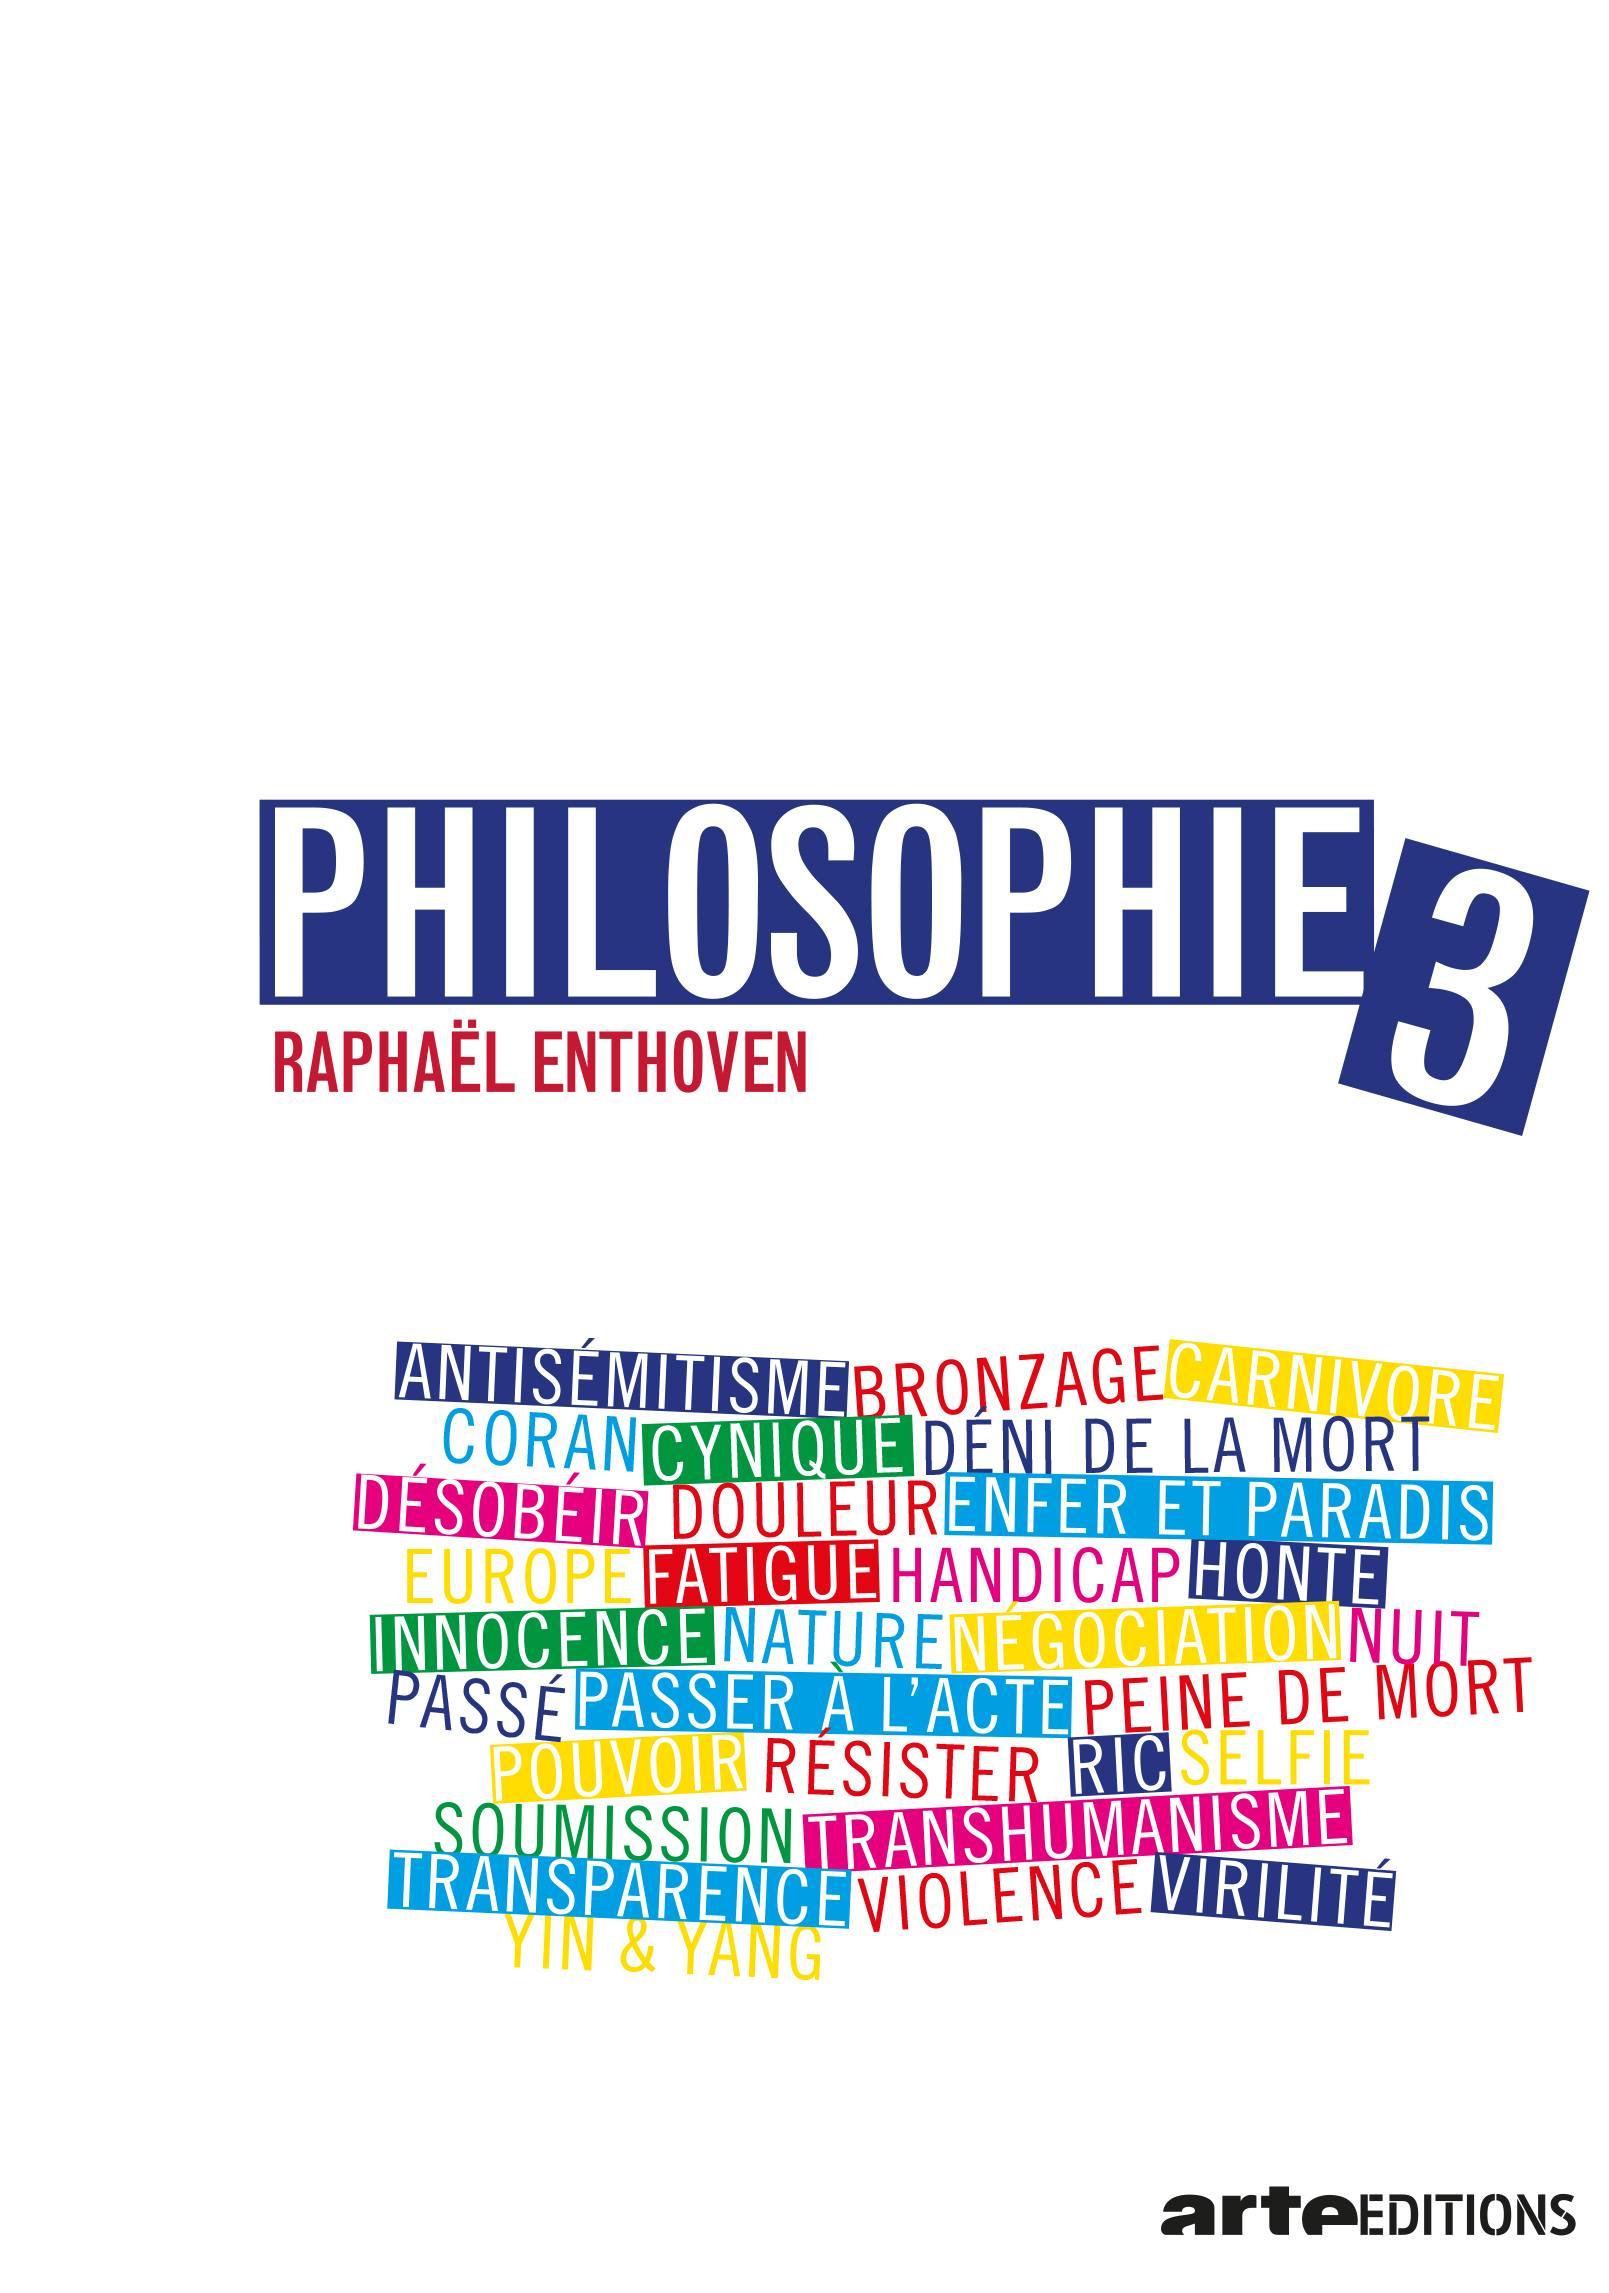 Philosophie vol 3 - 6 dvd